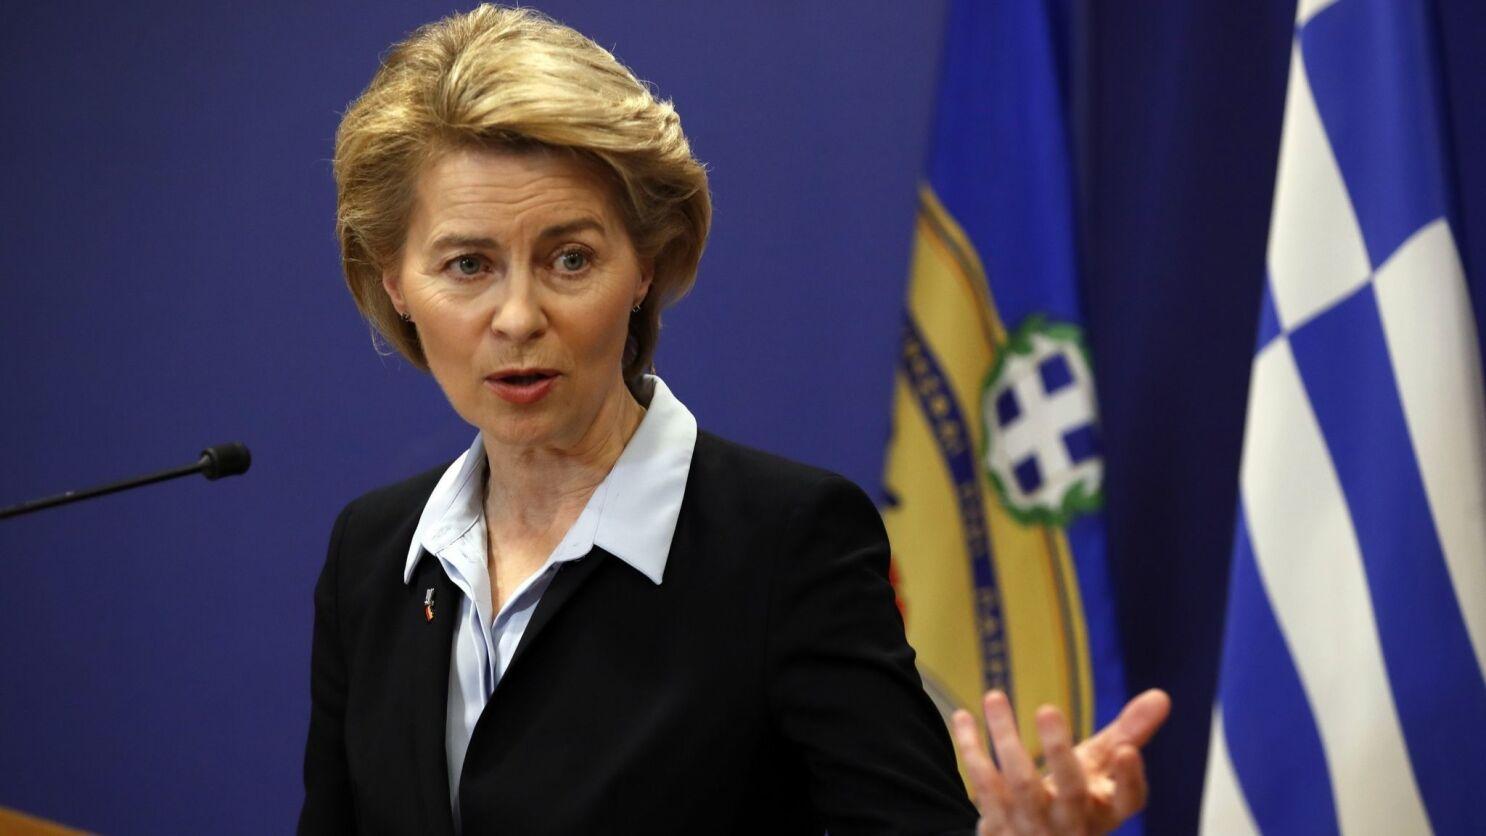 Ursula von der Leyen confirmed as new European Commission president - Los Angeles Times